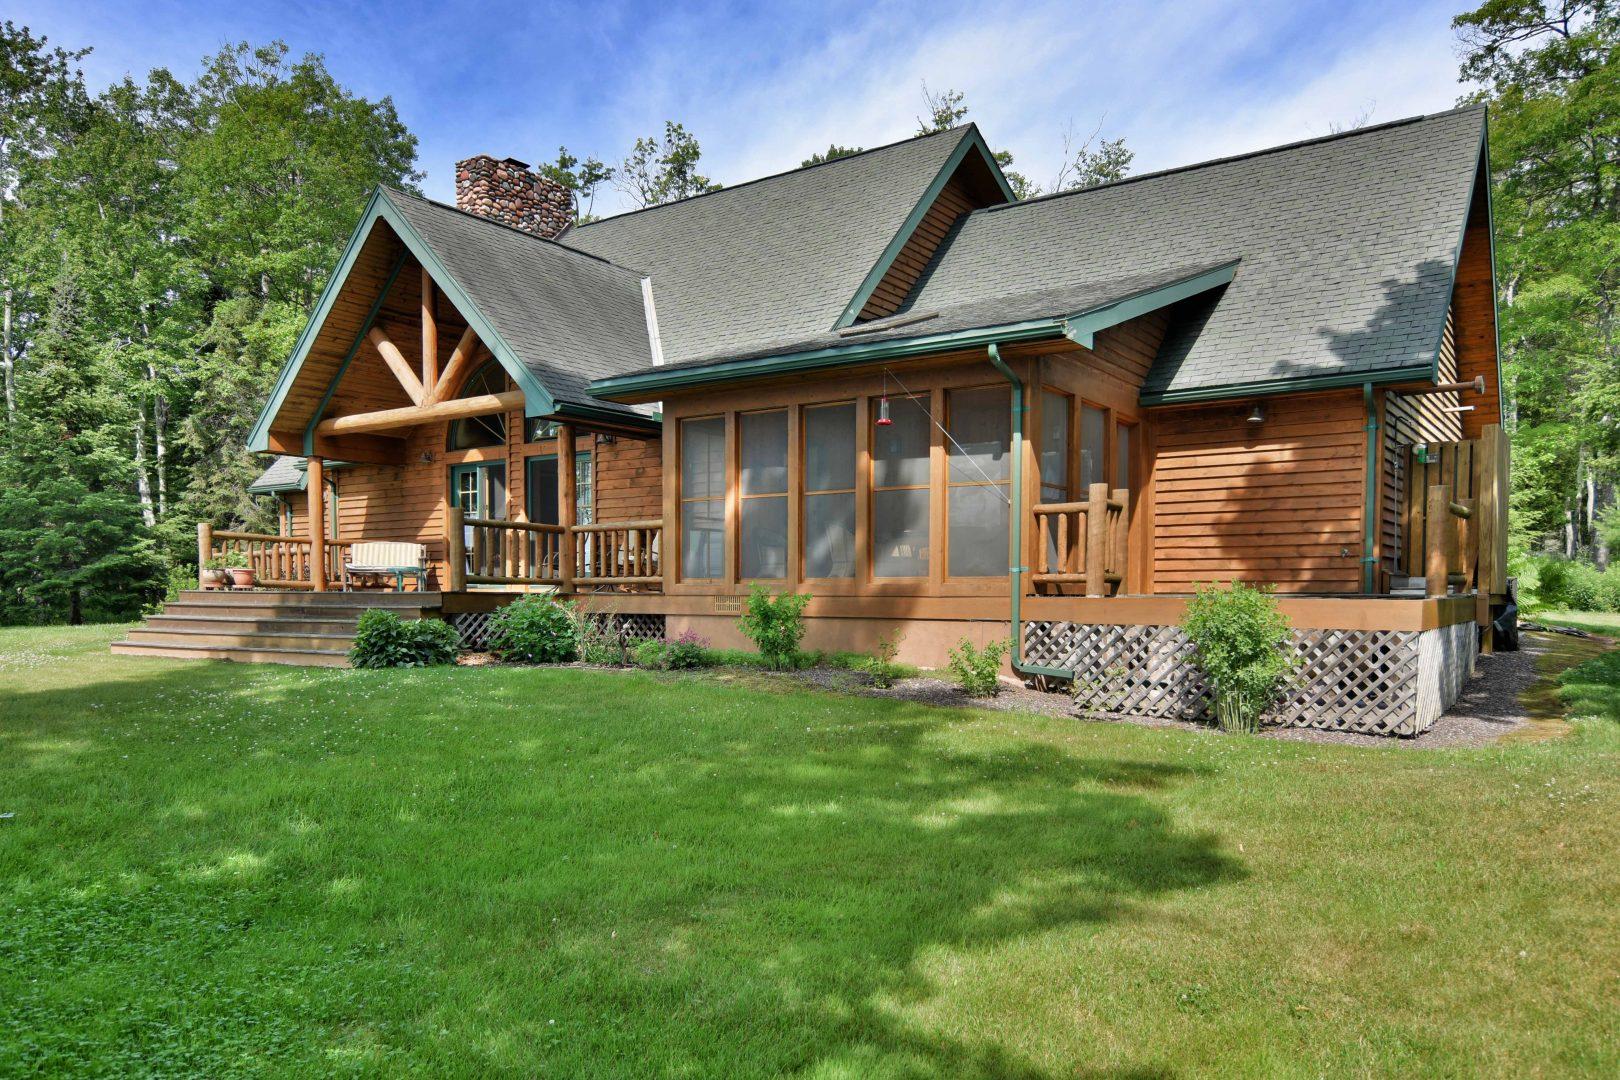 La Pointe Wisconsin Real Estate Virtual Tours